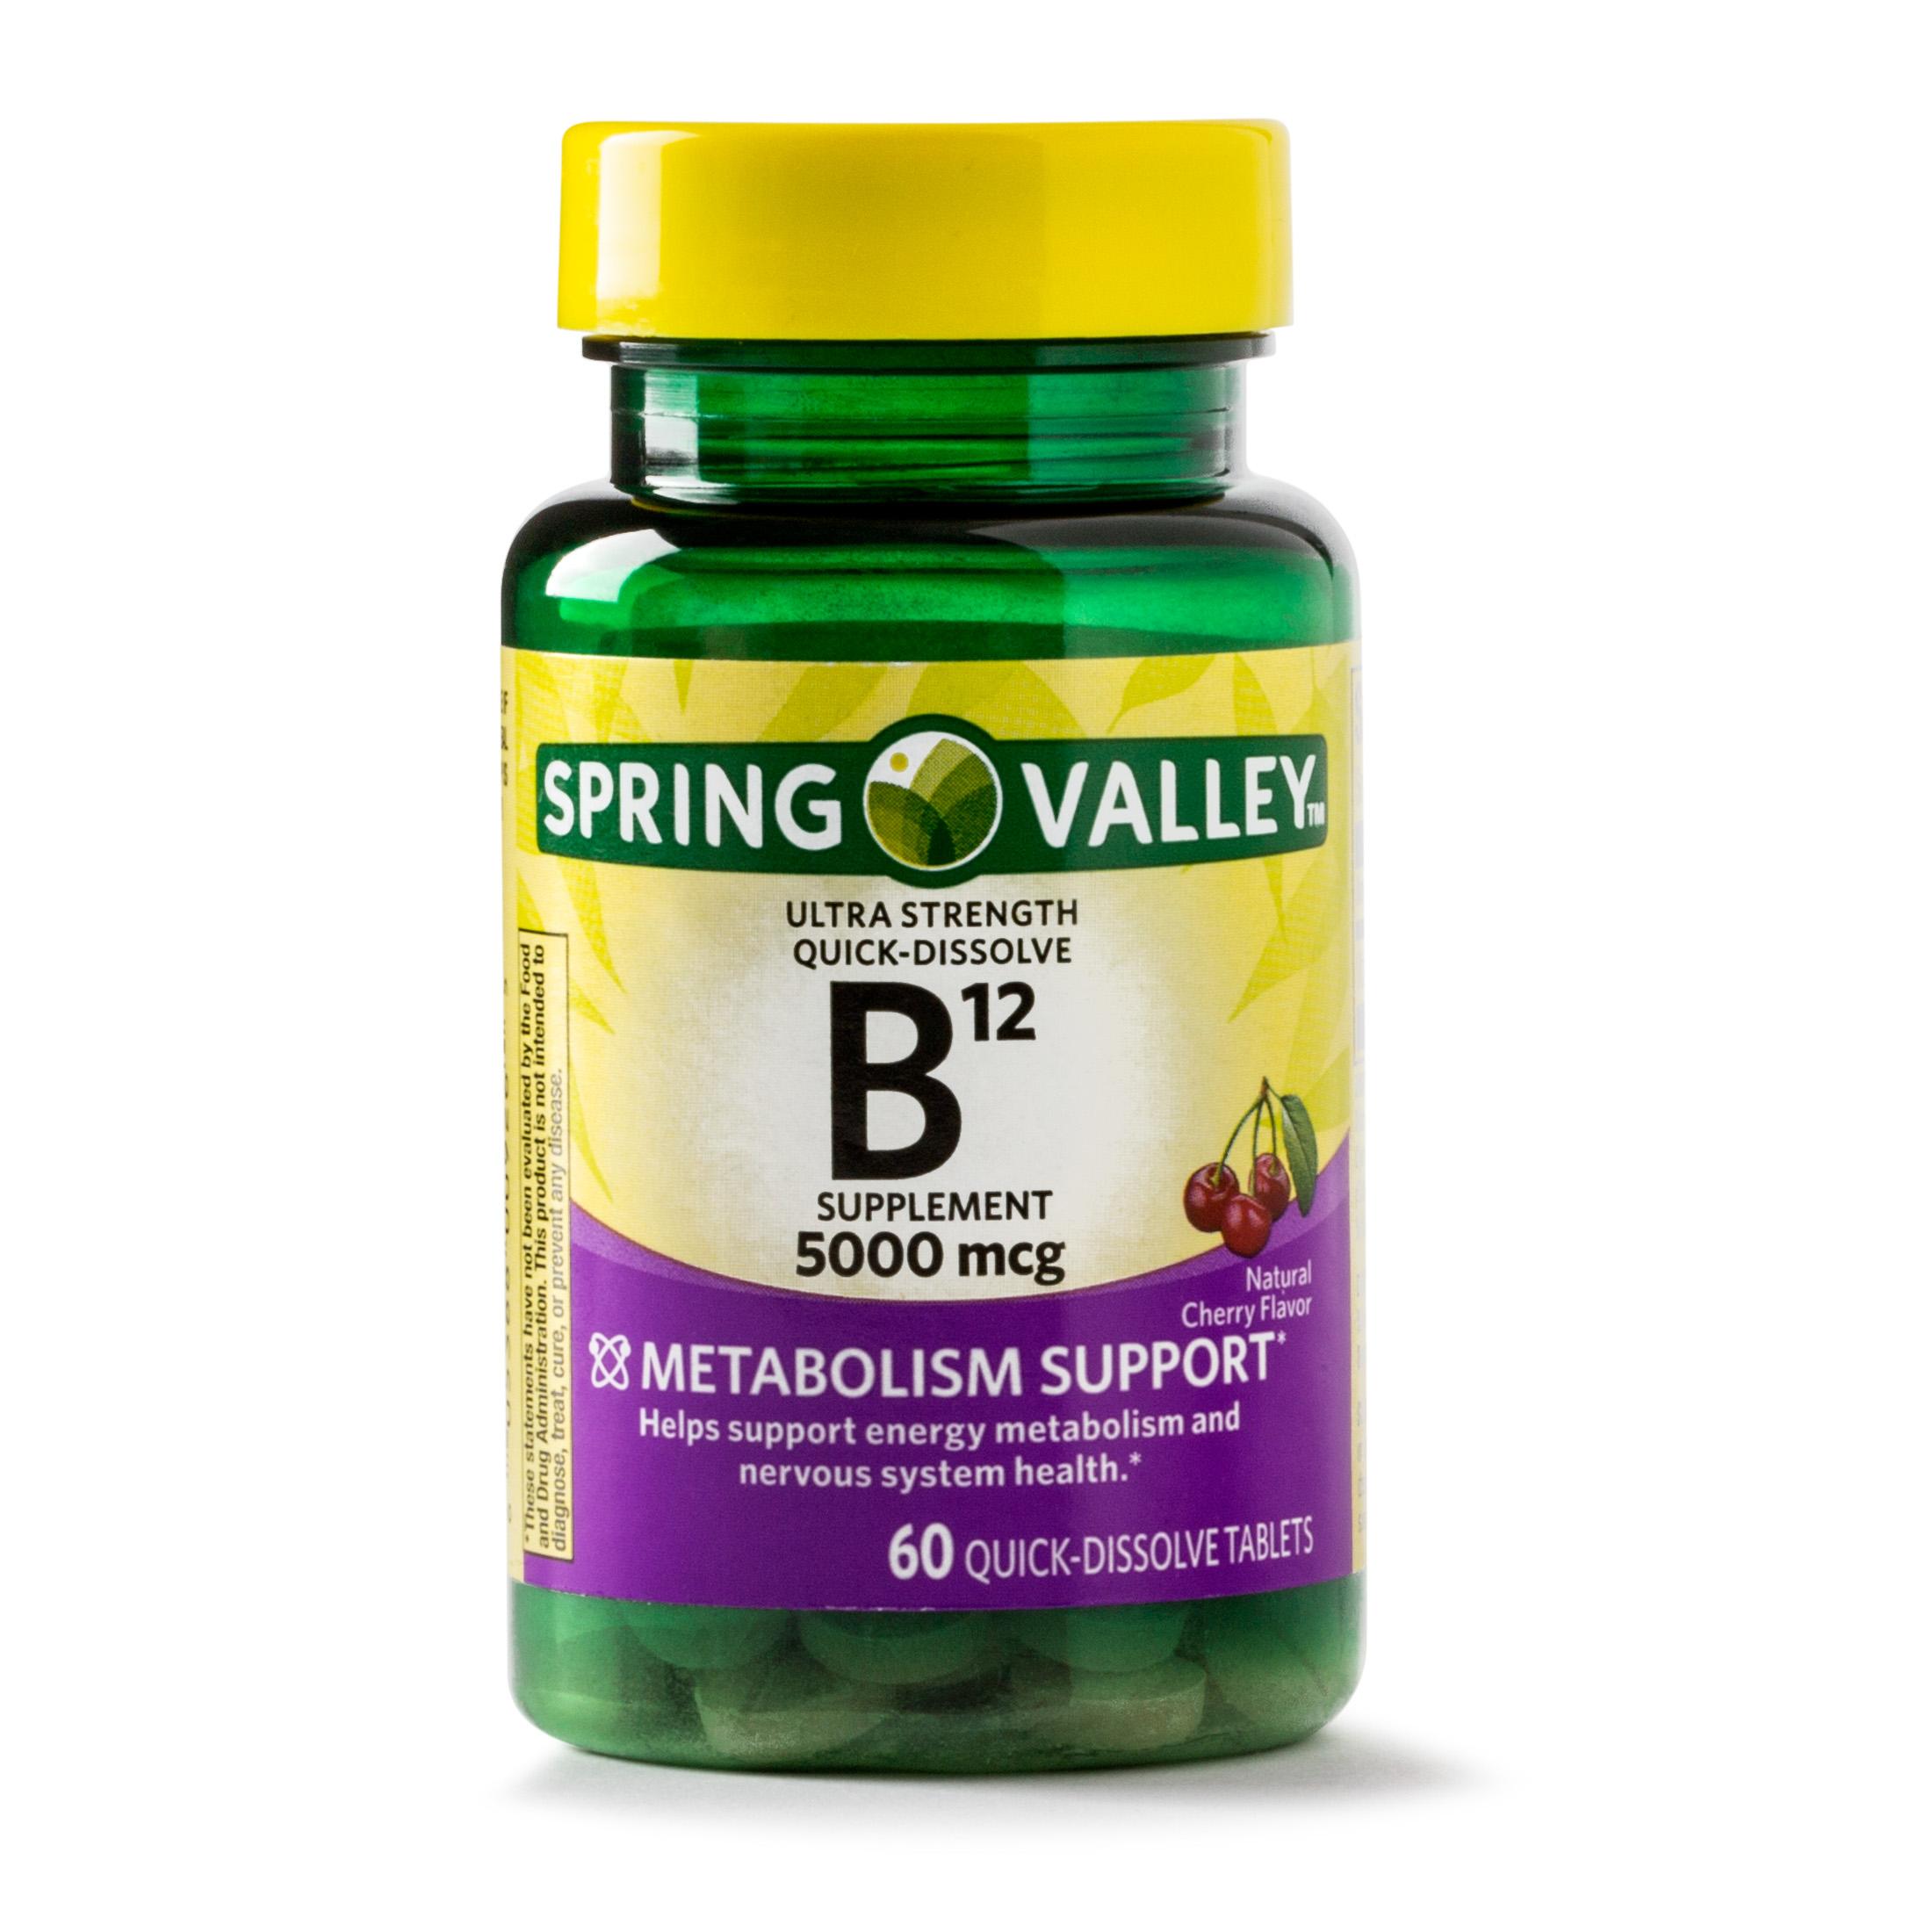 Spring Valley Vitamin B12 Quick Dissolve Tablets, 5000 mcg, 60 Ct